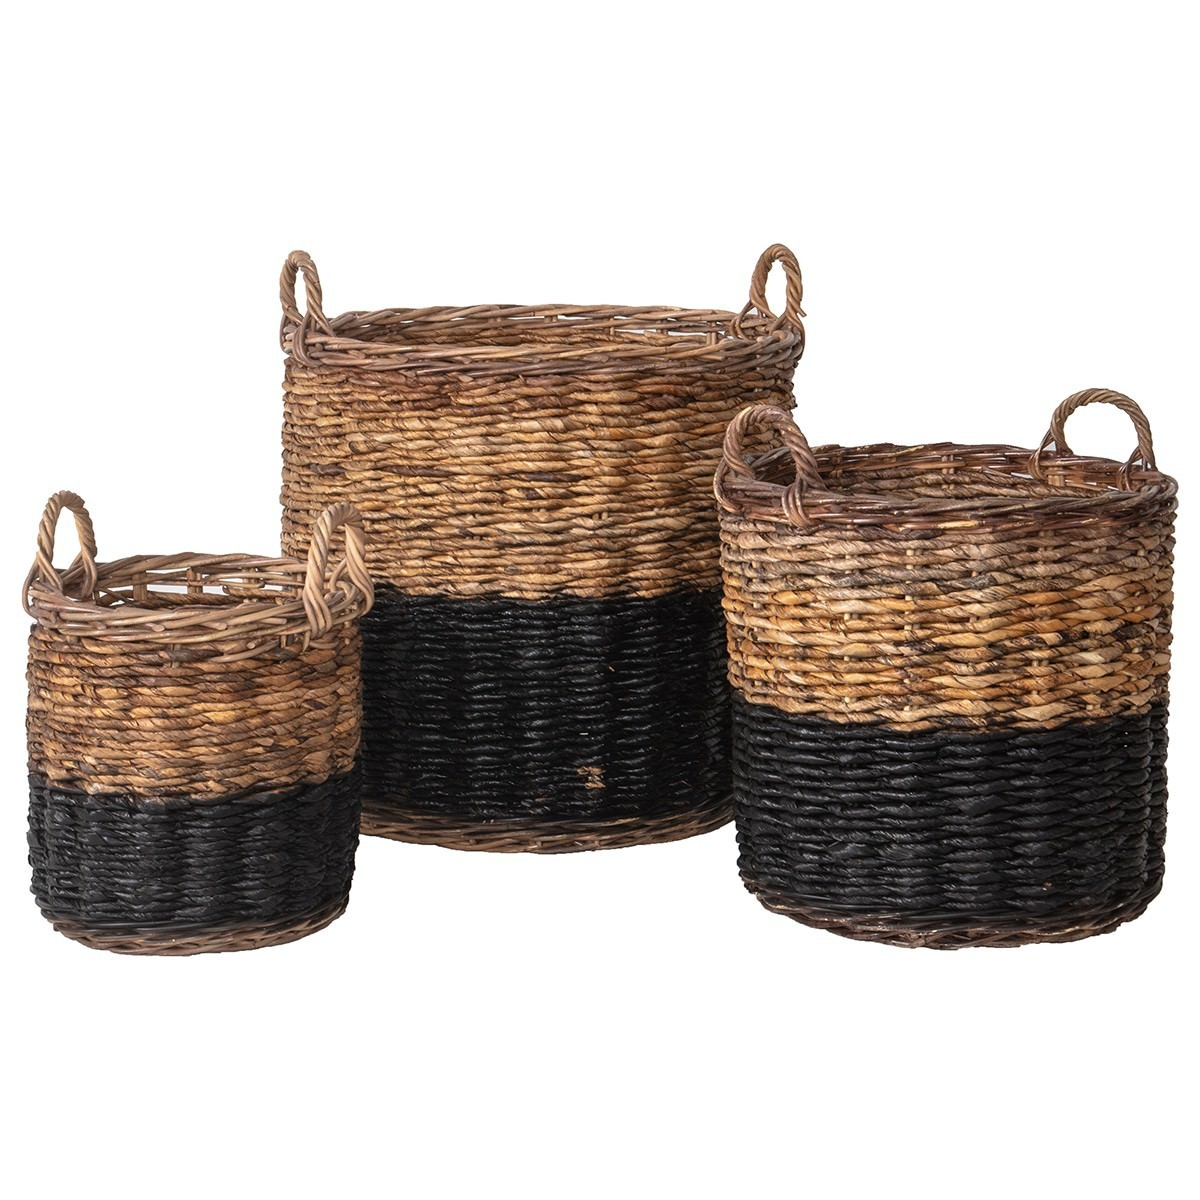 Covelo 3 Piece Rattan Basket Set, Natural / Black